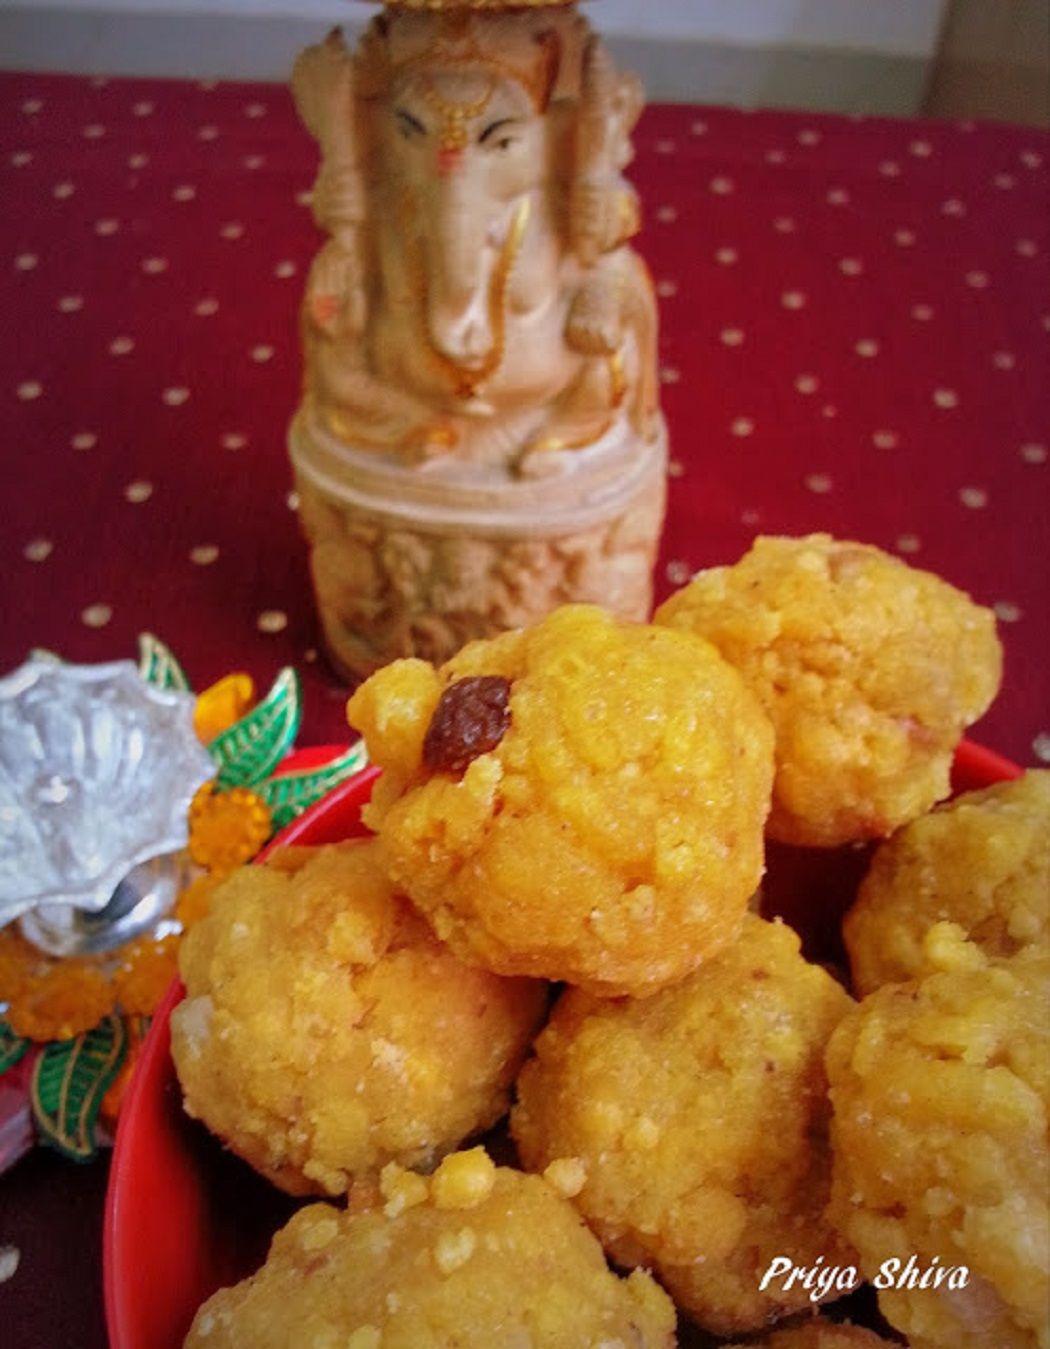 Boondi ladoo kunja laddu recipe indian desserts indian food boondi ladoo kunja laddu recipe indian desserts indian food recipes and recipe community forumfinder Choice Image